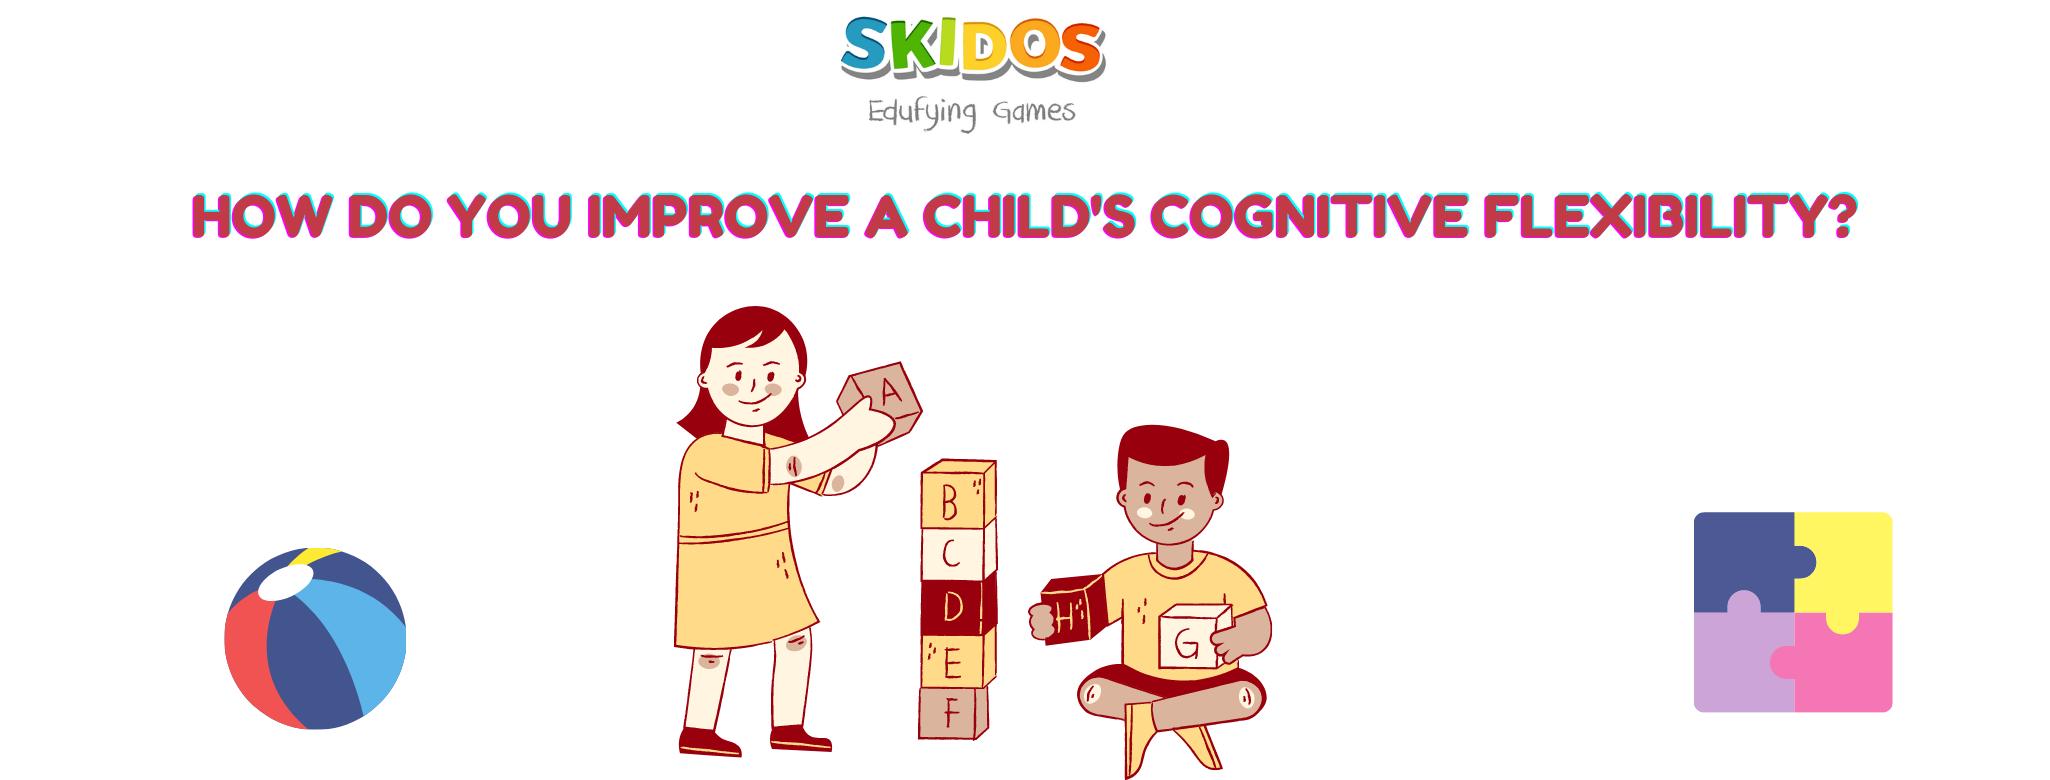 How do you improve a child's cognitive flexibility